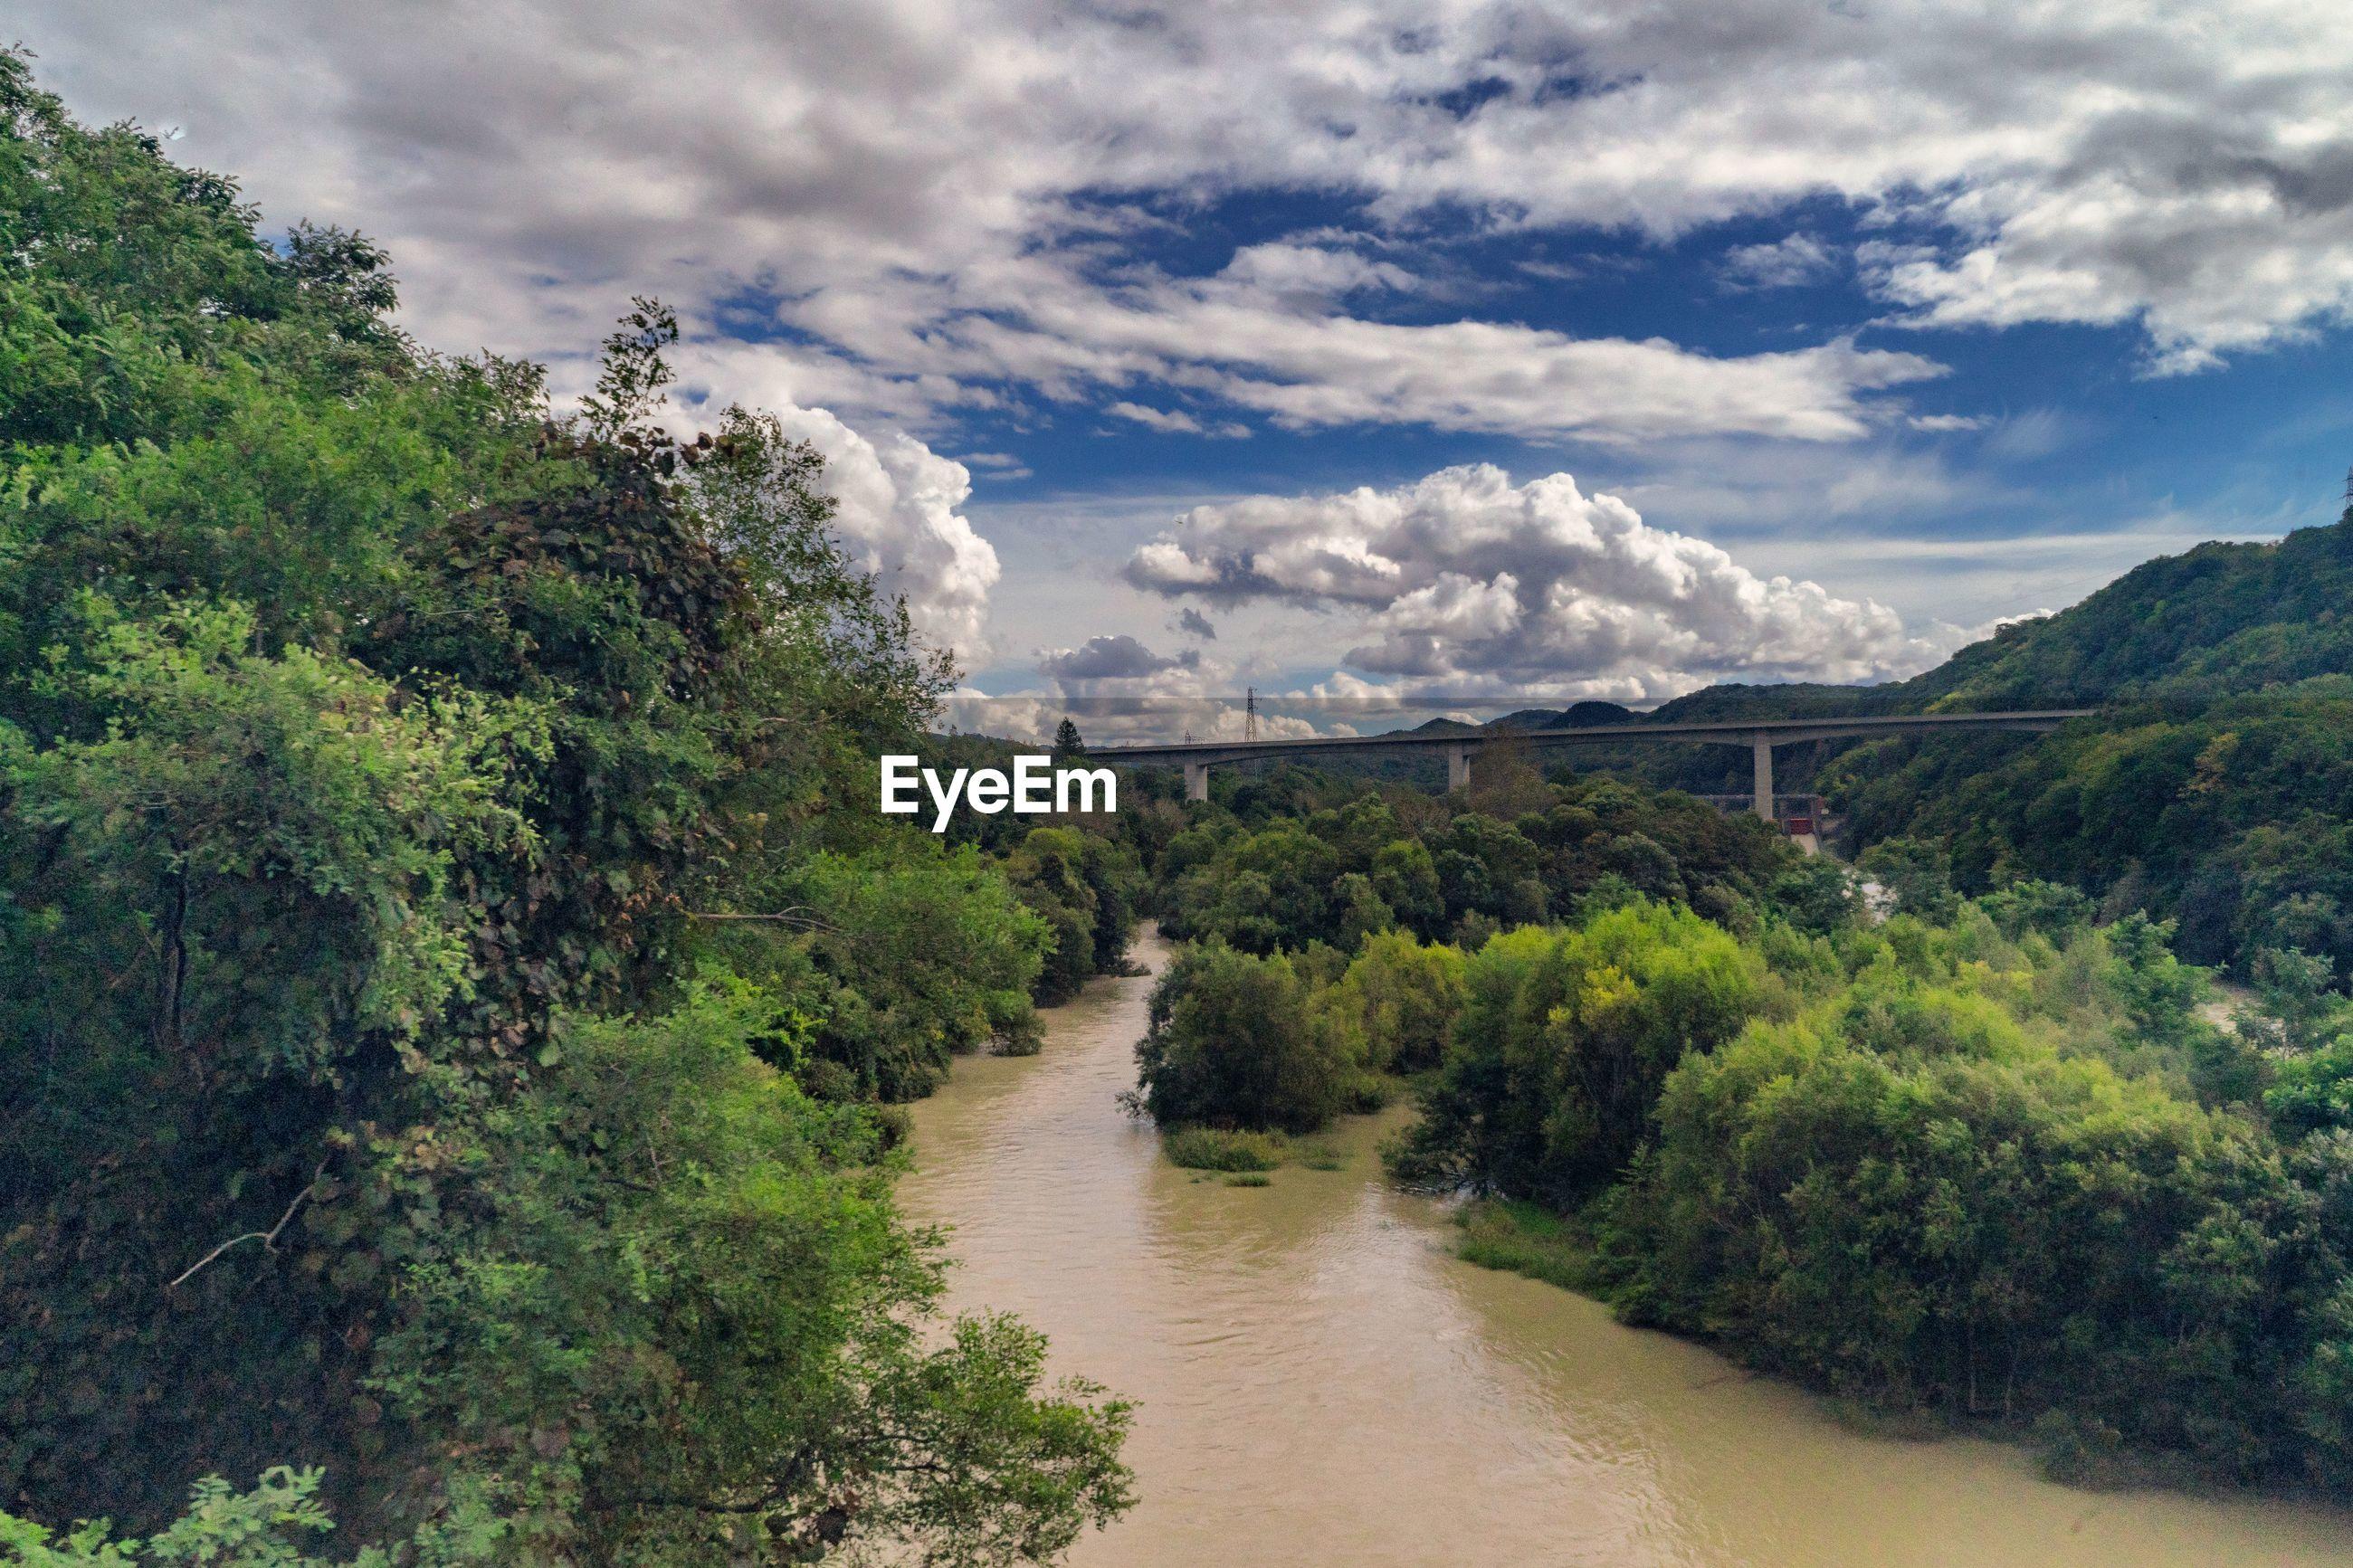 RIVER AMIDST GREEN LANDSCAPE AGAINST SKY